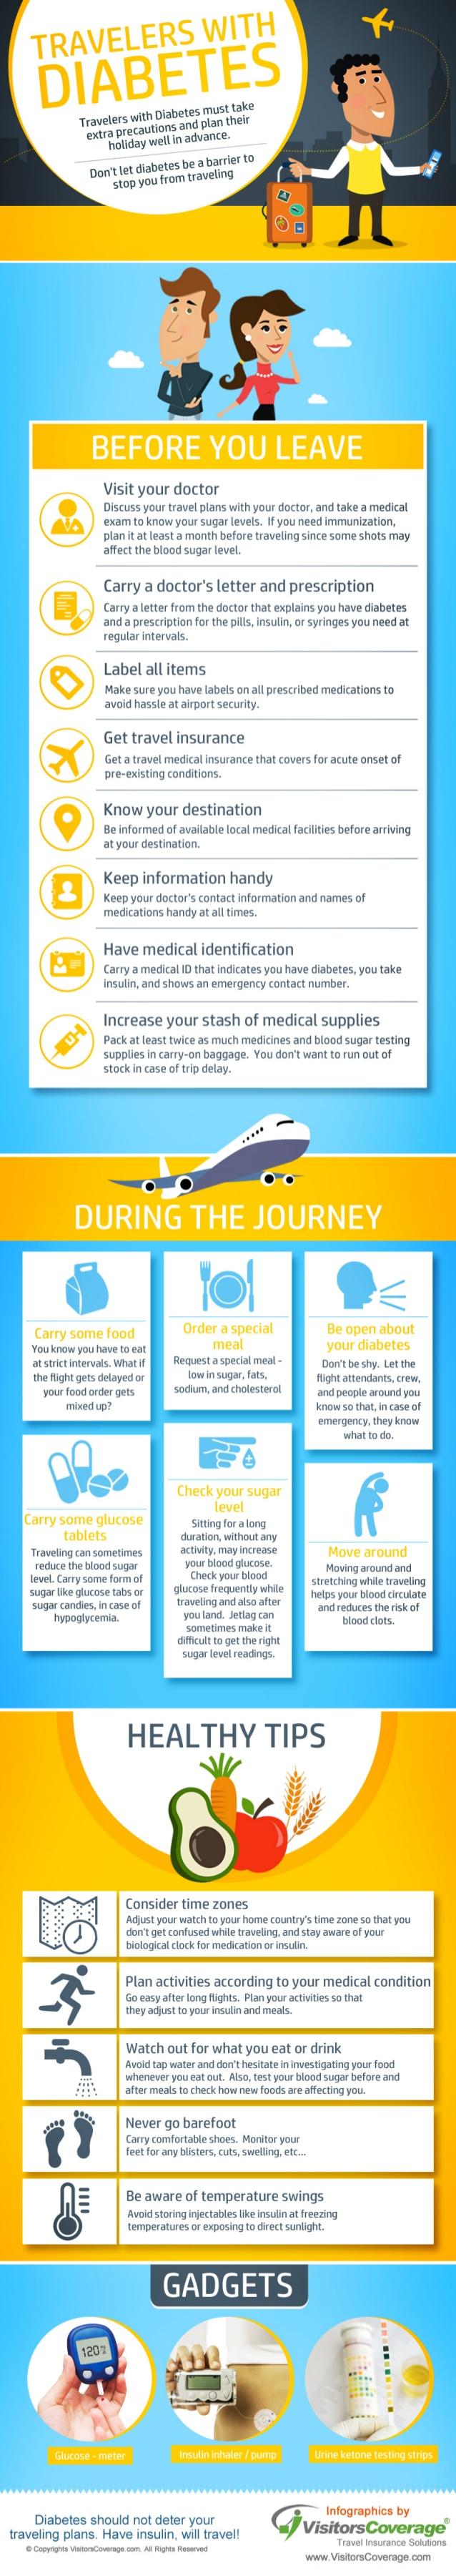 Consejos para viajeros don diabetes